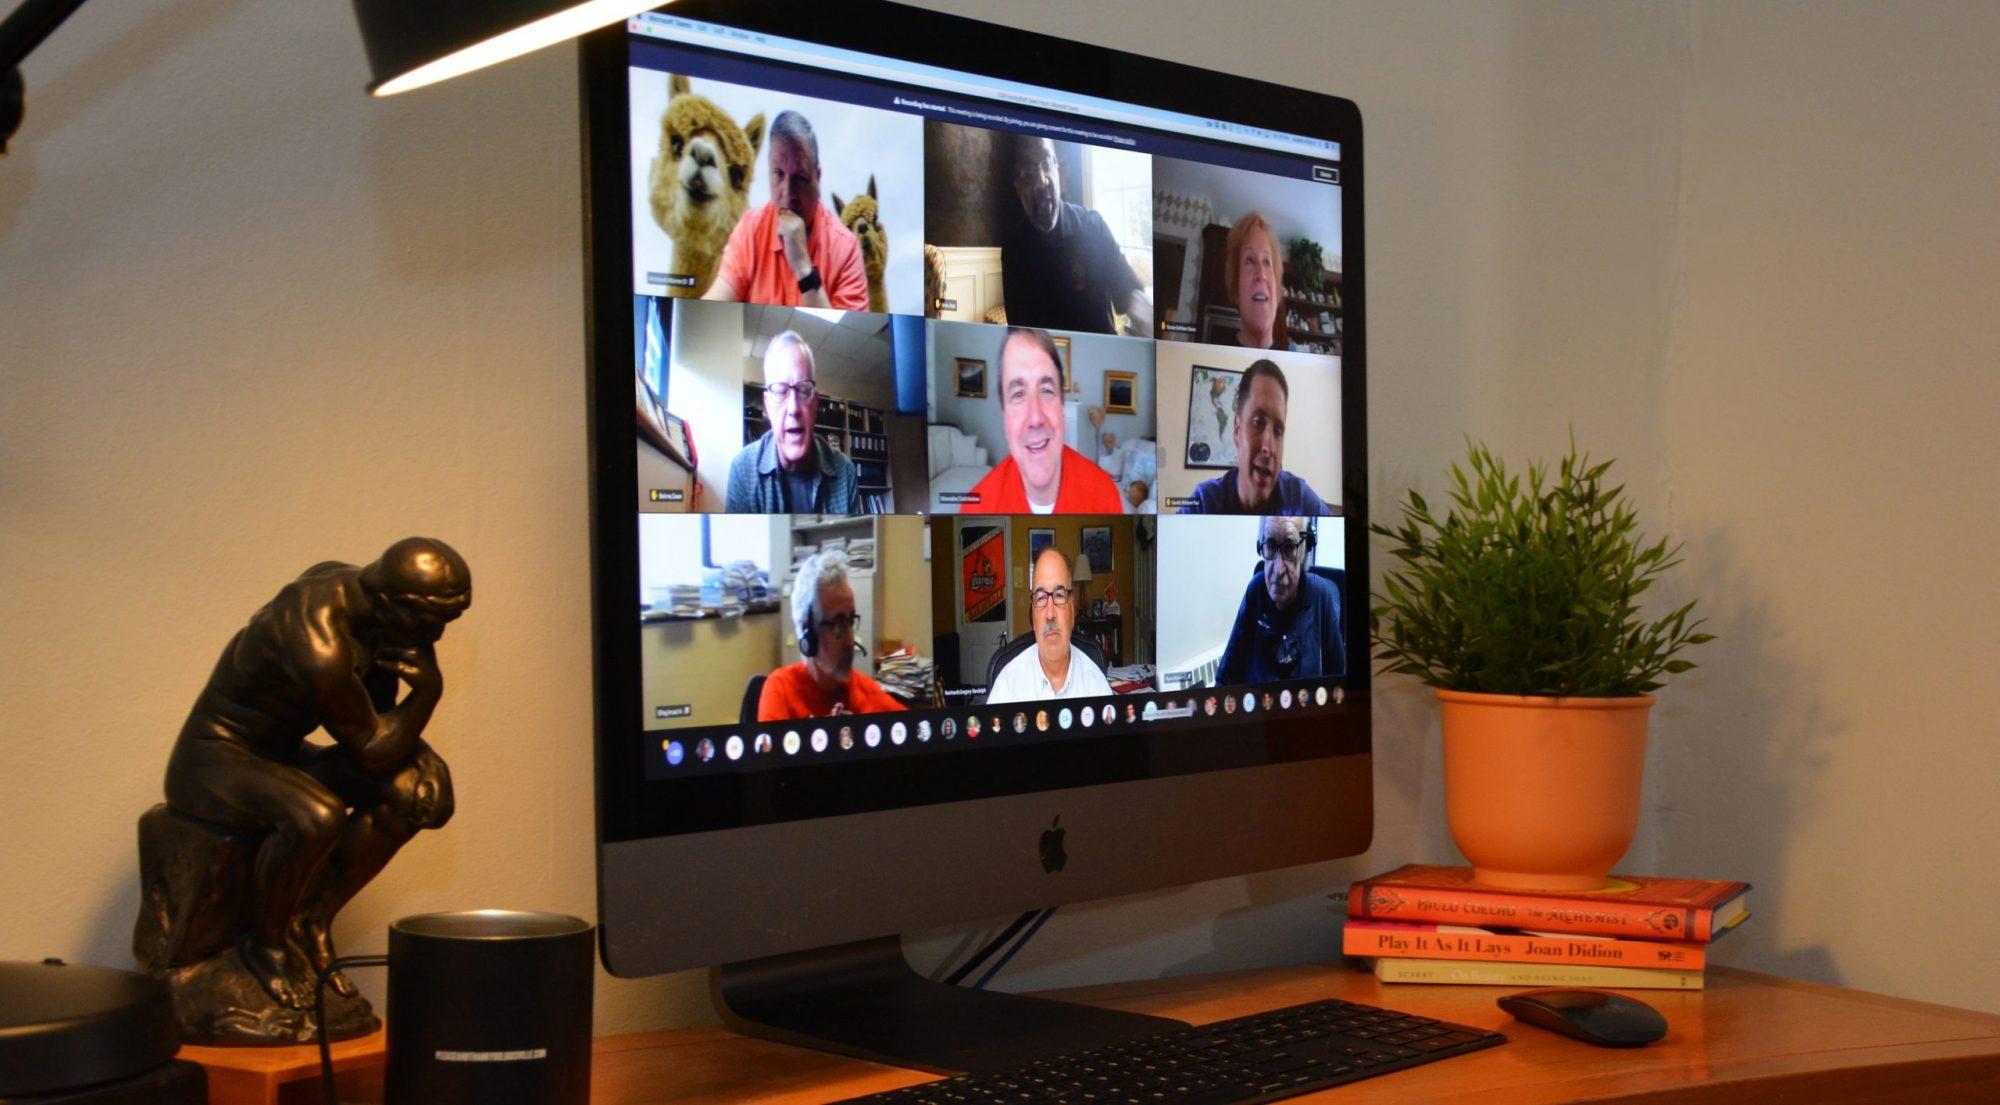 An Imac displaying an MS TEAMS meeting.